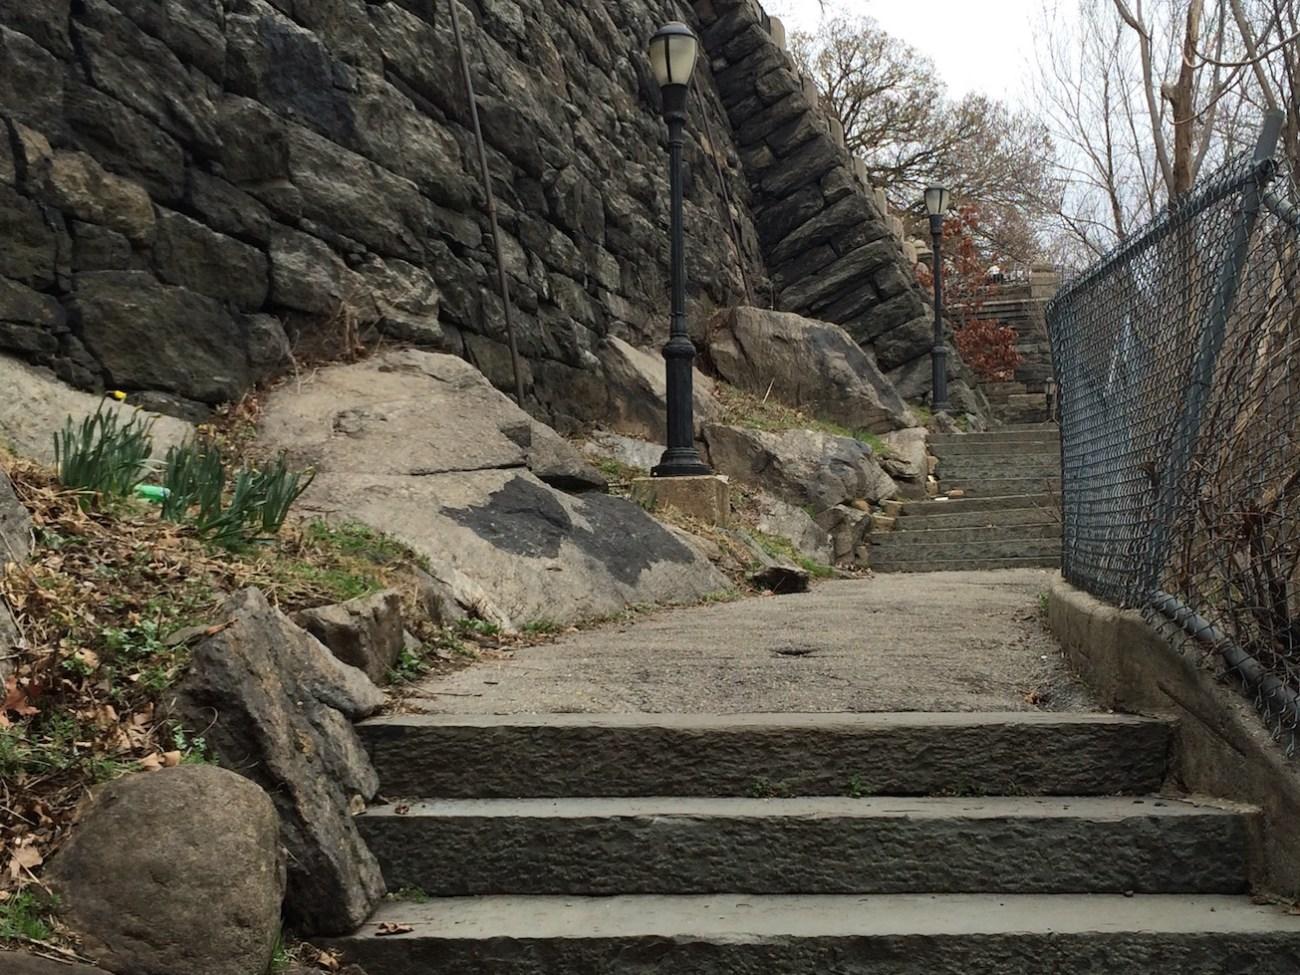 Morningside Park Stair Workout 13